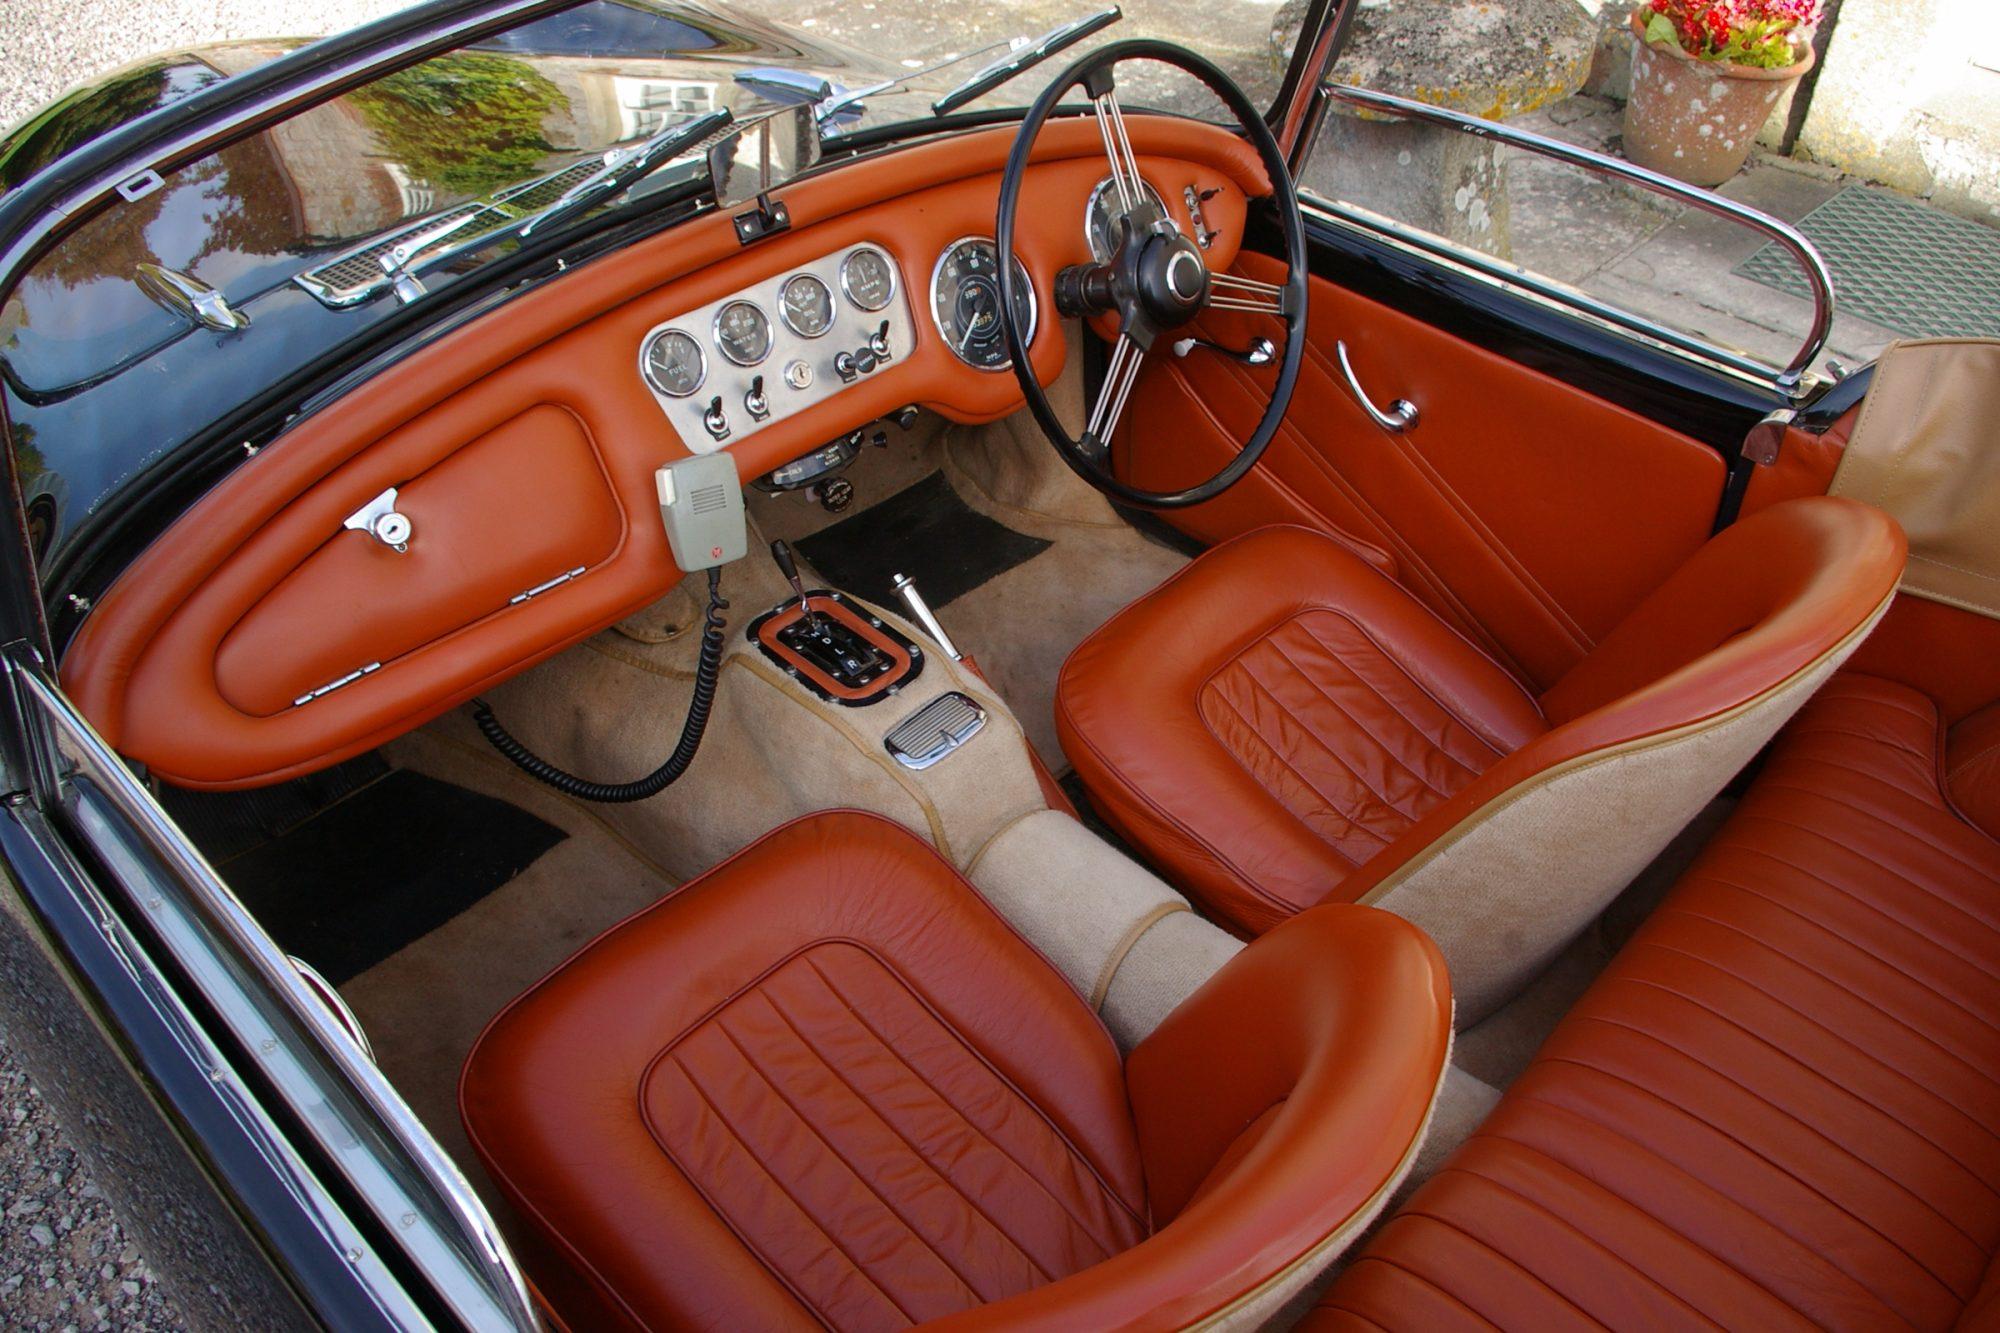 Daimler, Daimler Dart, Dart, Daimler SP250, Jaguar, sports car, Hemi, Hemi V8, classic car, retro car, motoring, automotive, carandclassic, carandclassic.co.uk, motoring, automotive